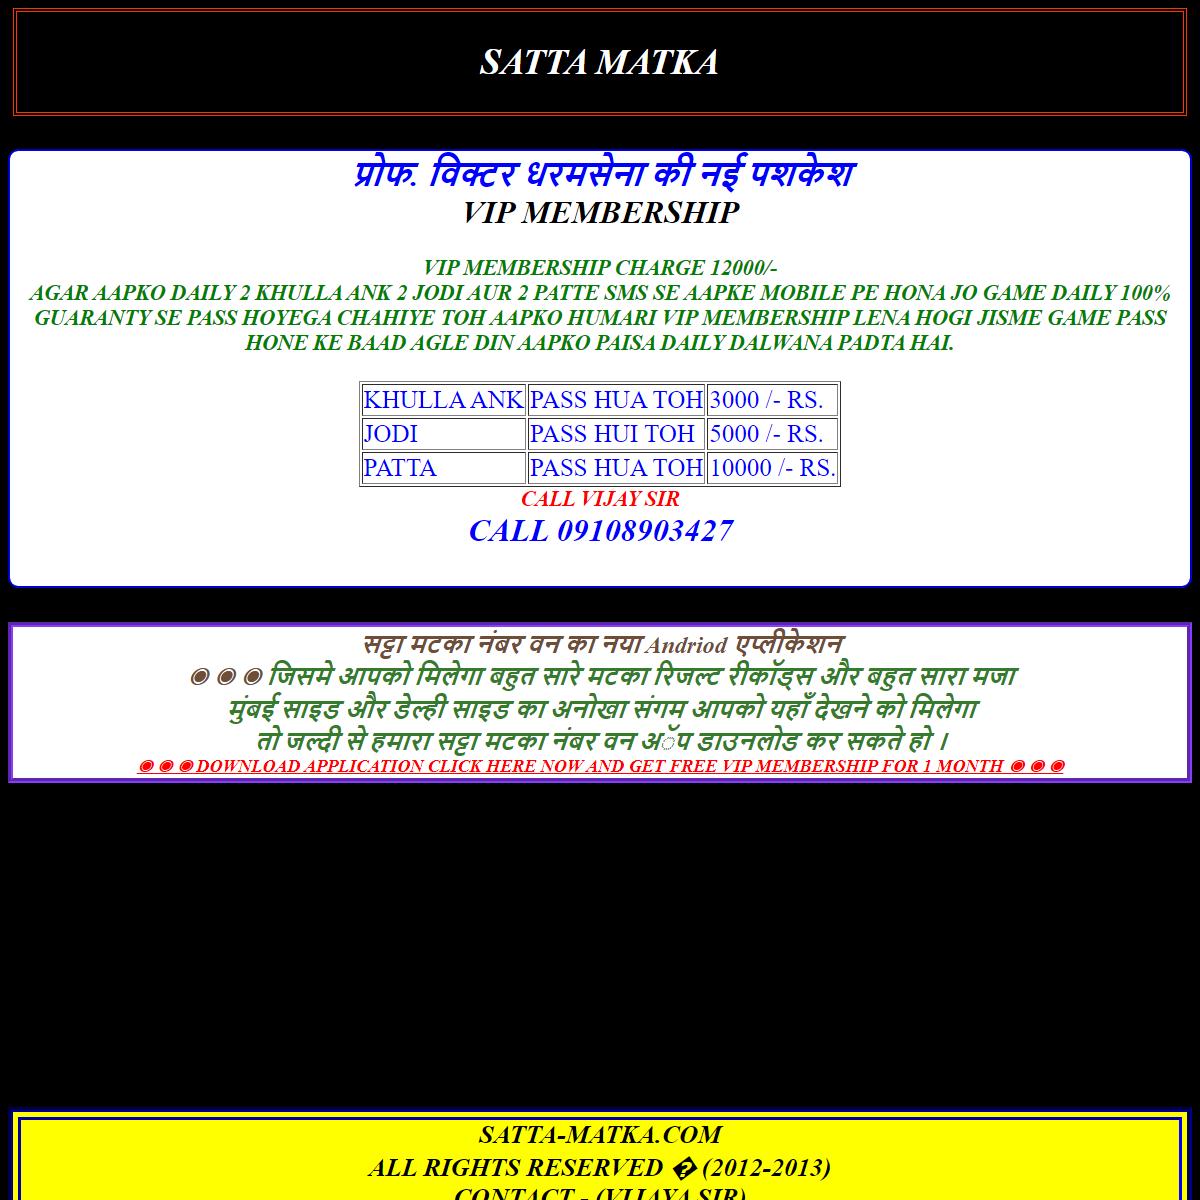 Vip Membership - Satta Matka - Kalyan Matka Result - Satta-Matka.com